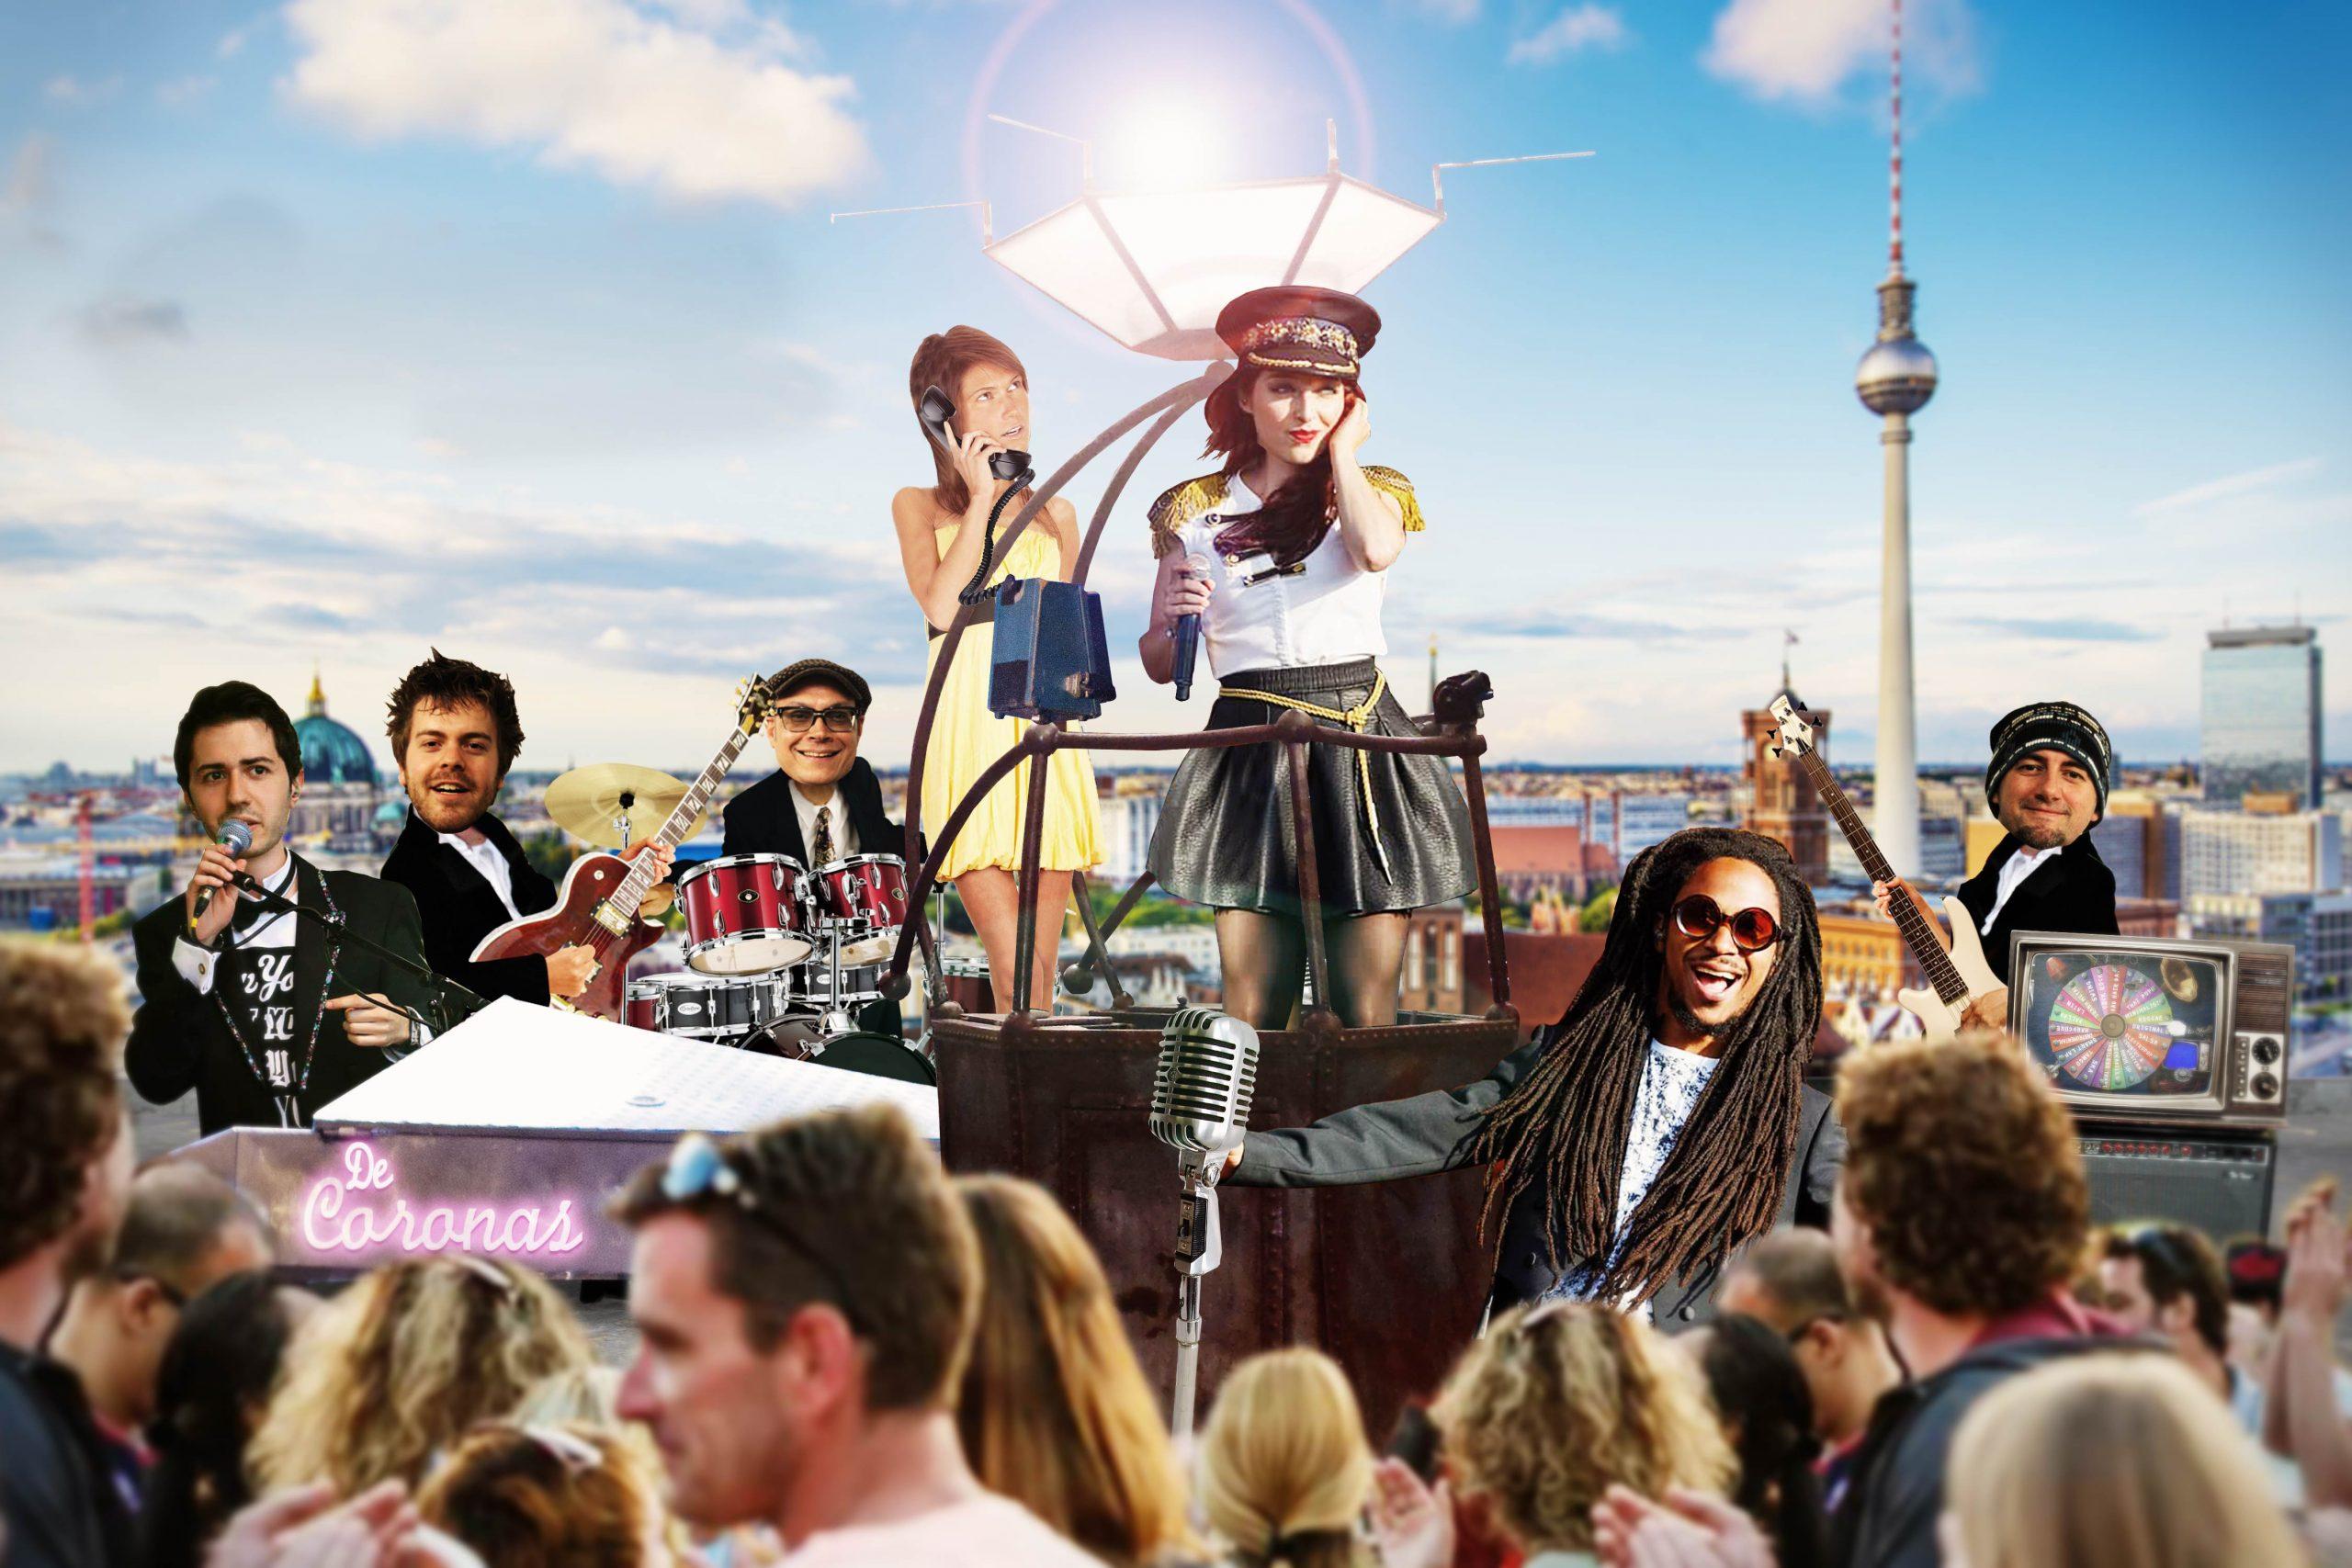 Live Muziek Weekoverzicht Scheveningen: week 15/9 – 21/9